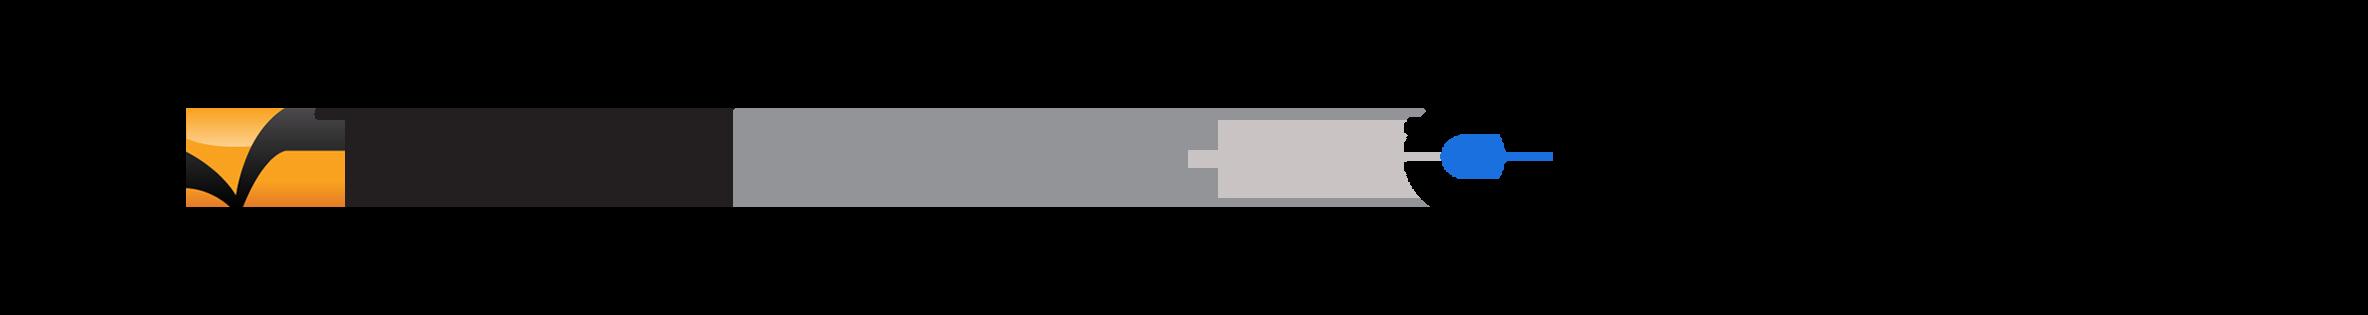 Trustpilot and Runscope logos